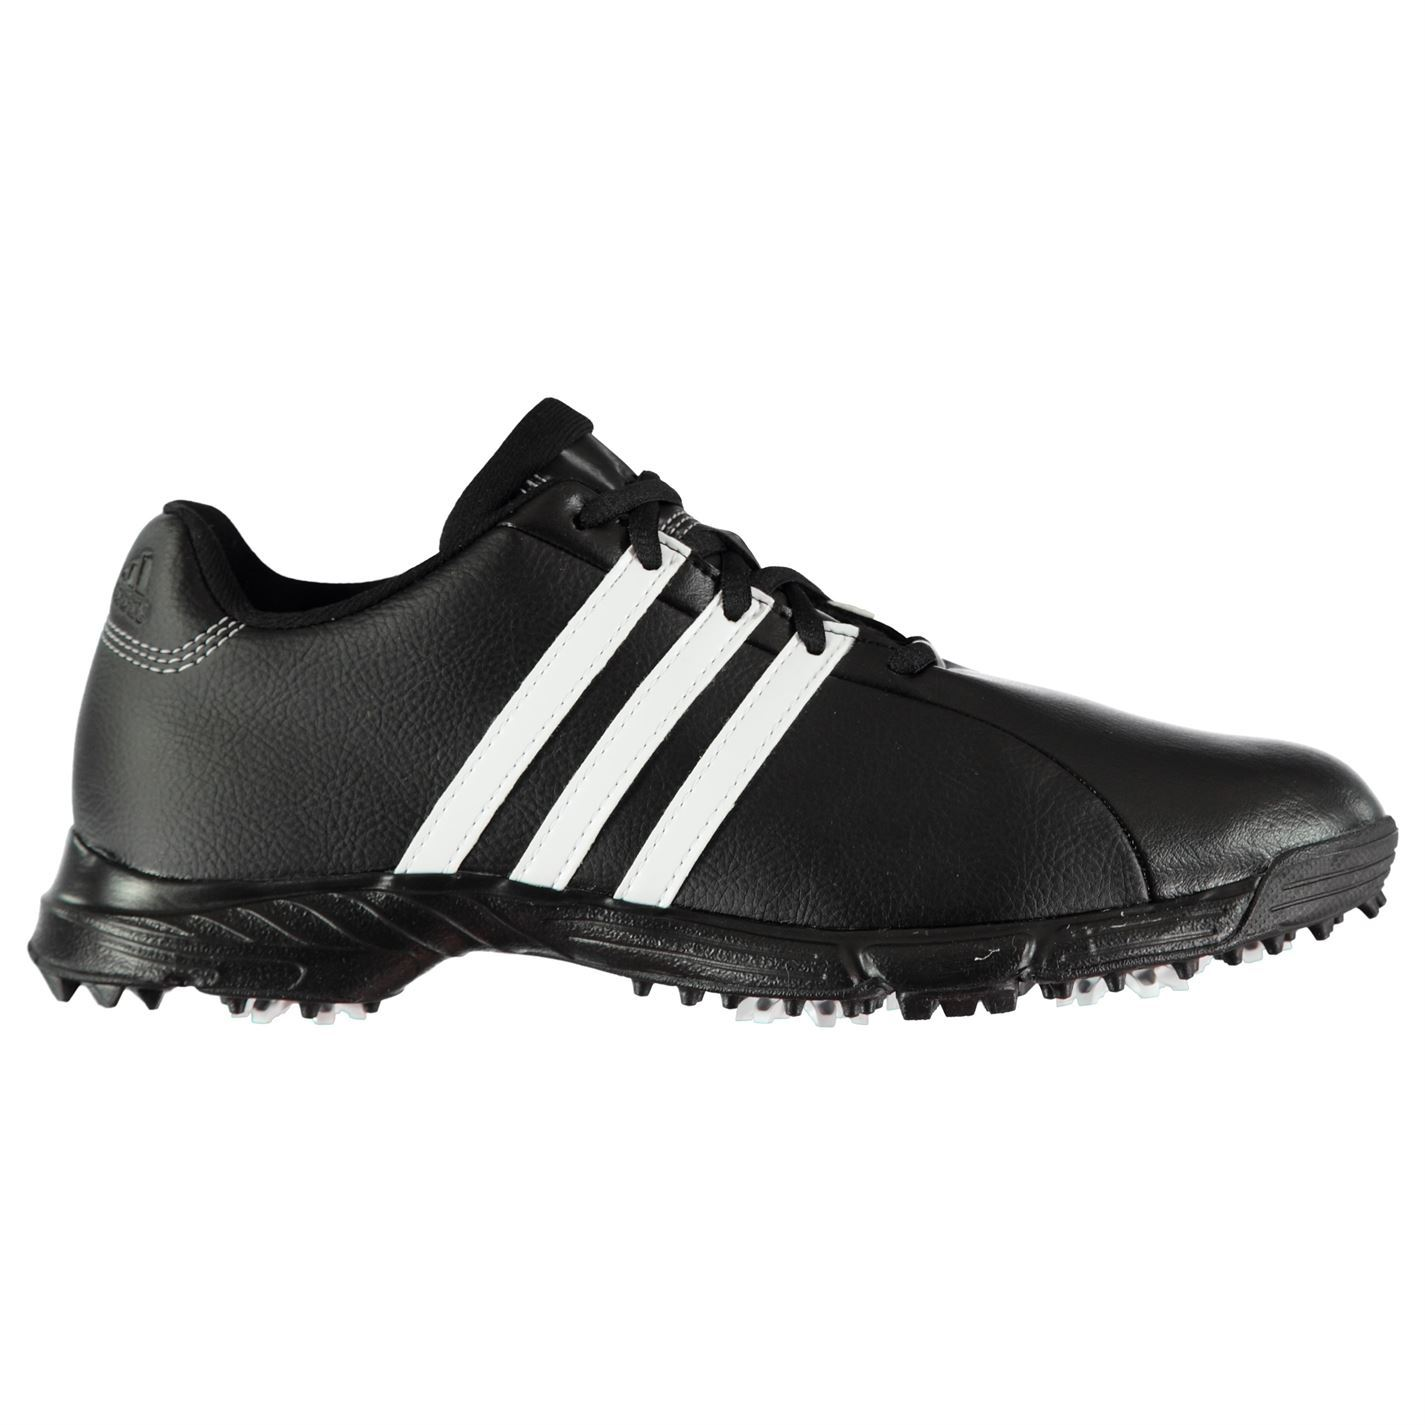 adidas-Golflite-Golf-Shoes-Mens-Spikes-Footwear thumbnail 7